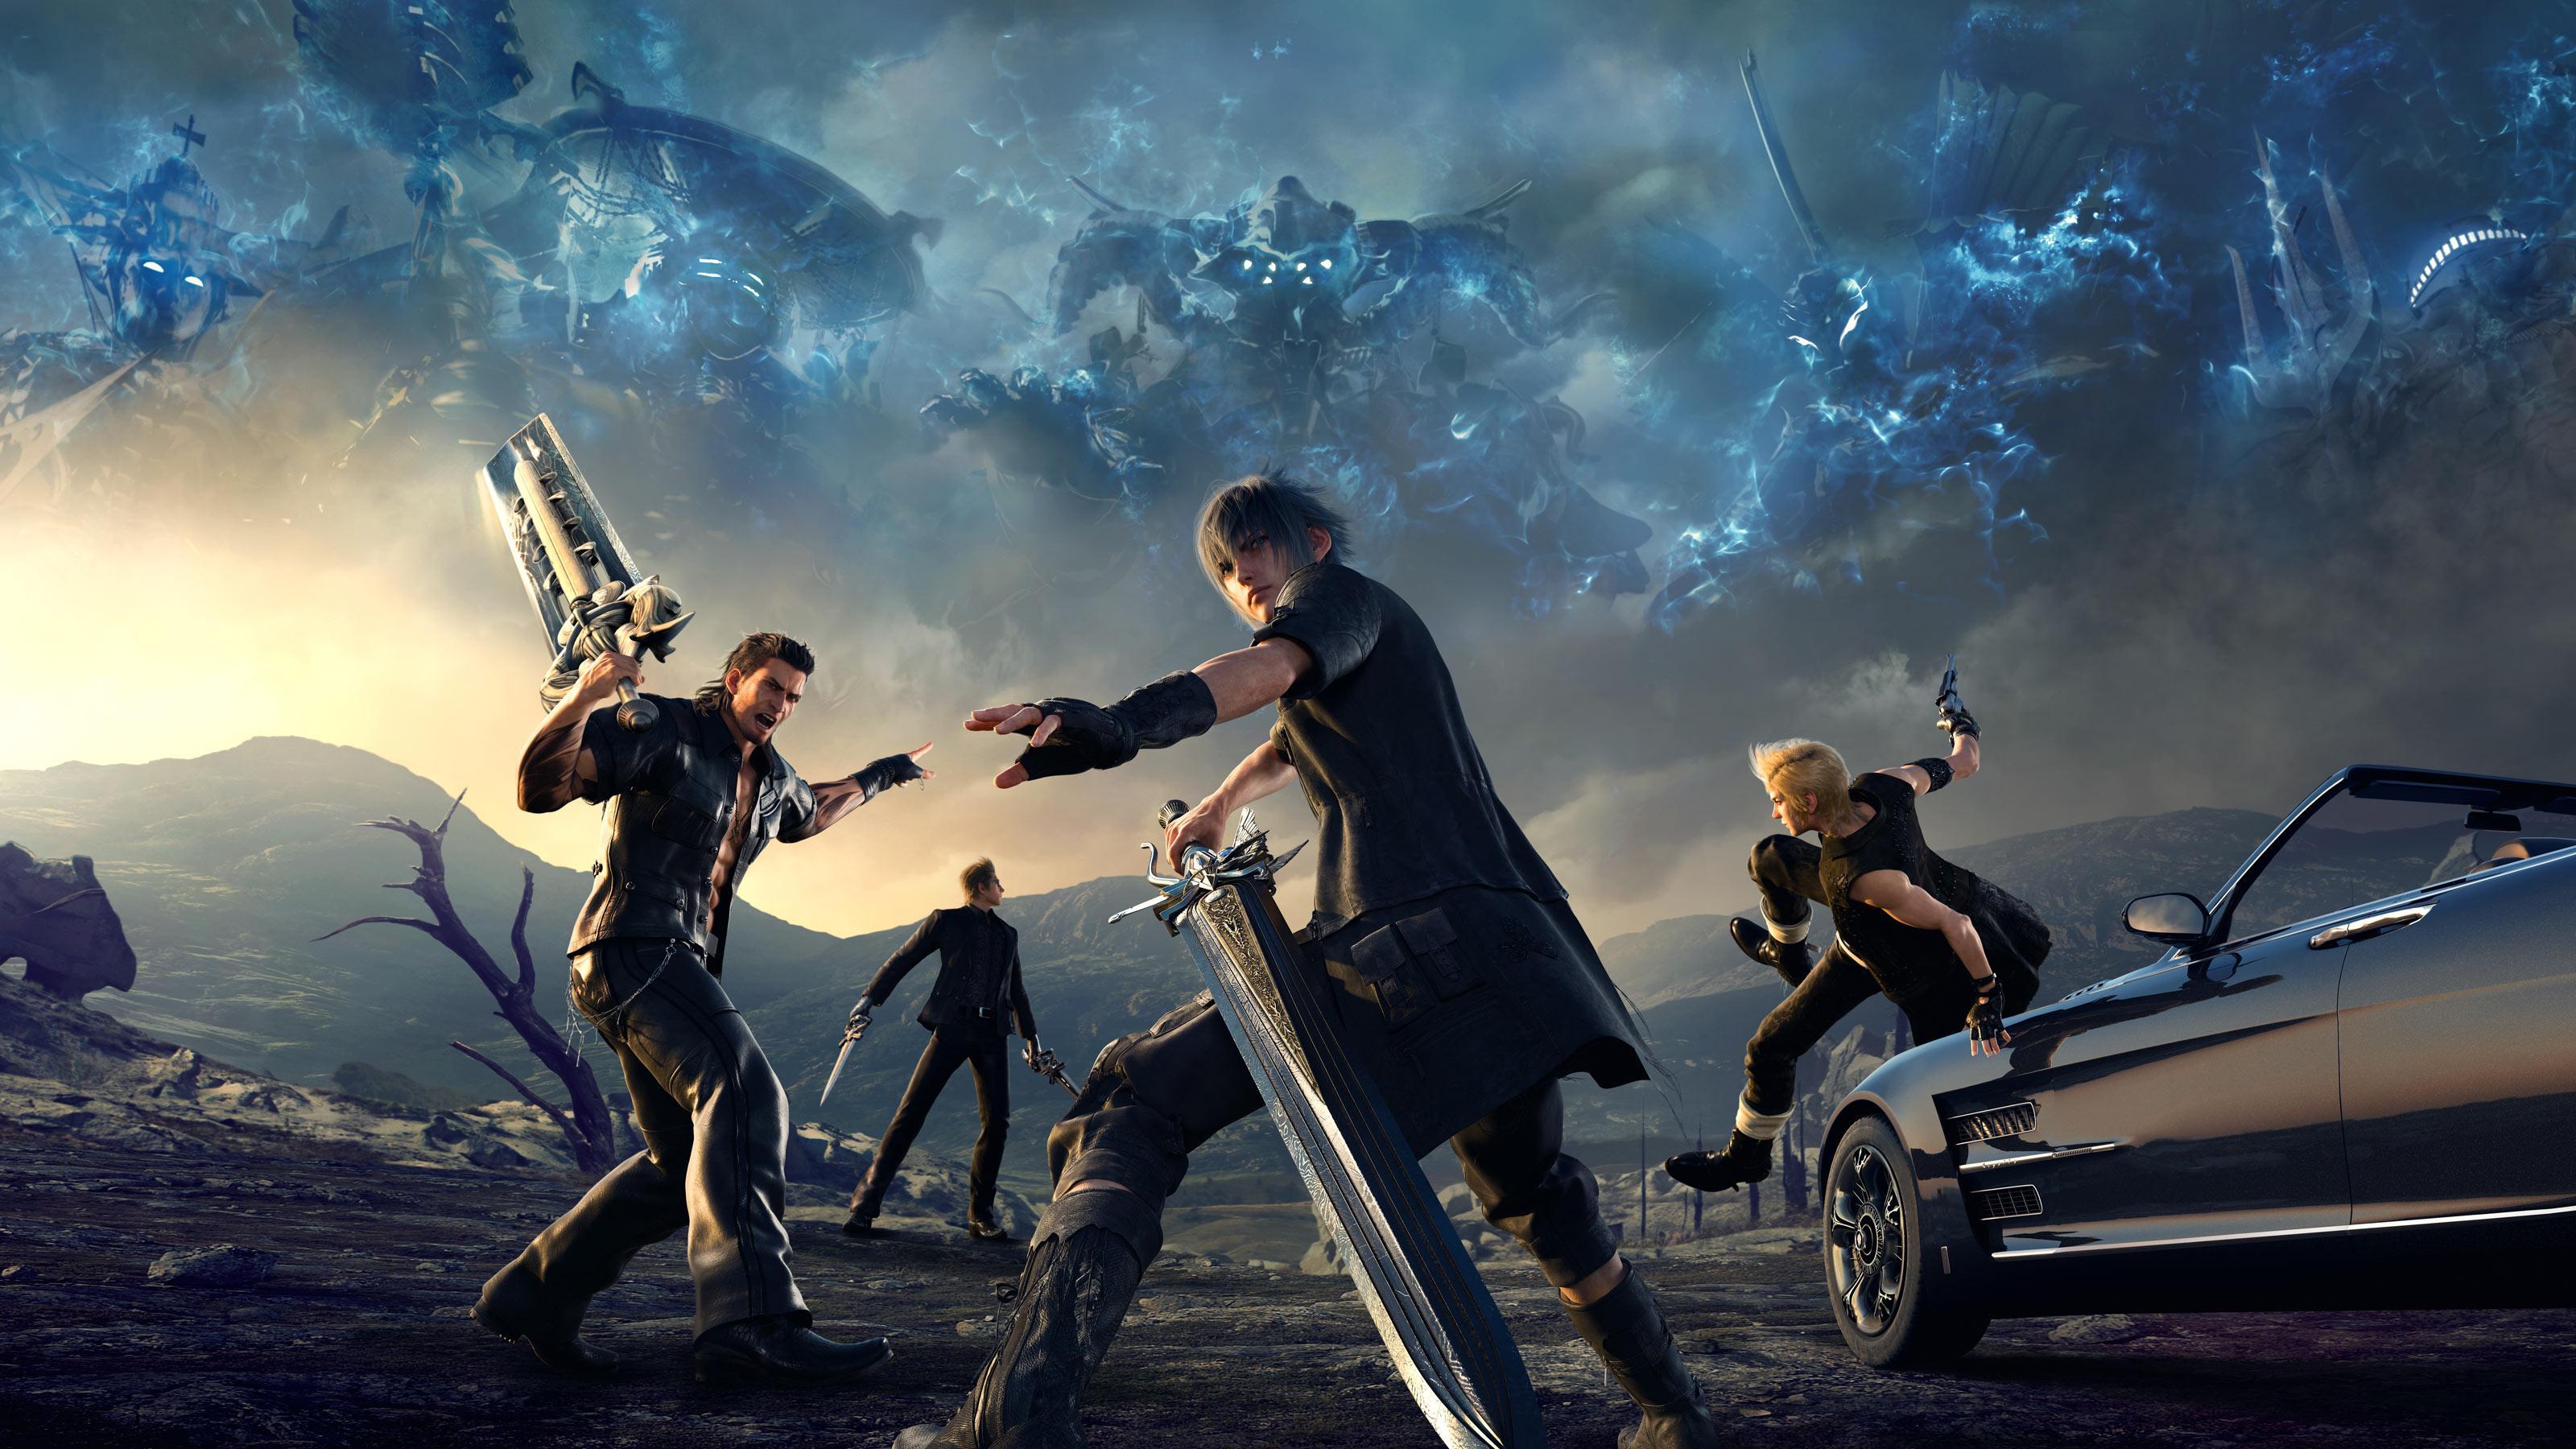 Final Fantasy Xv Wallpapers Top Free Final Fantasy Xv Backgrounds Wallpaperaccess